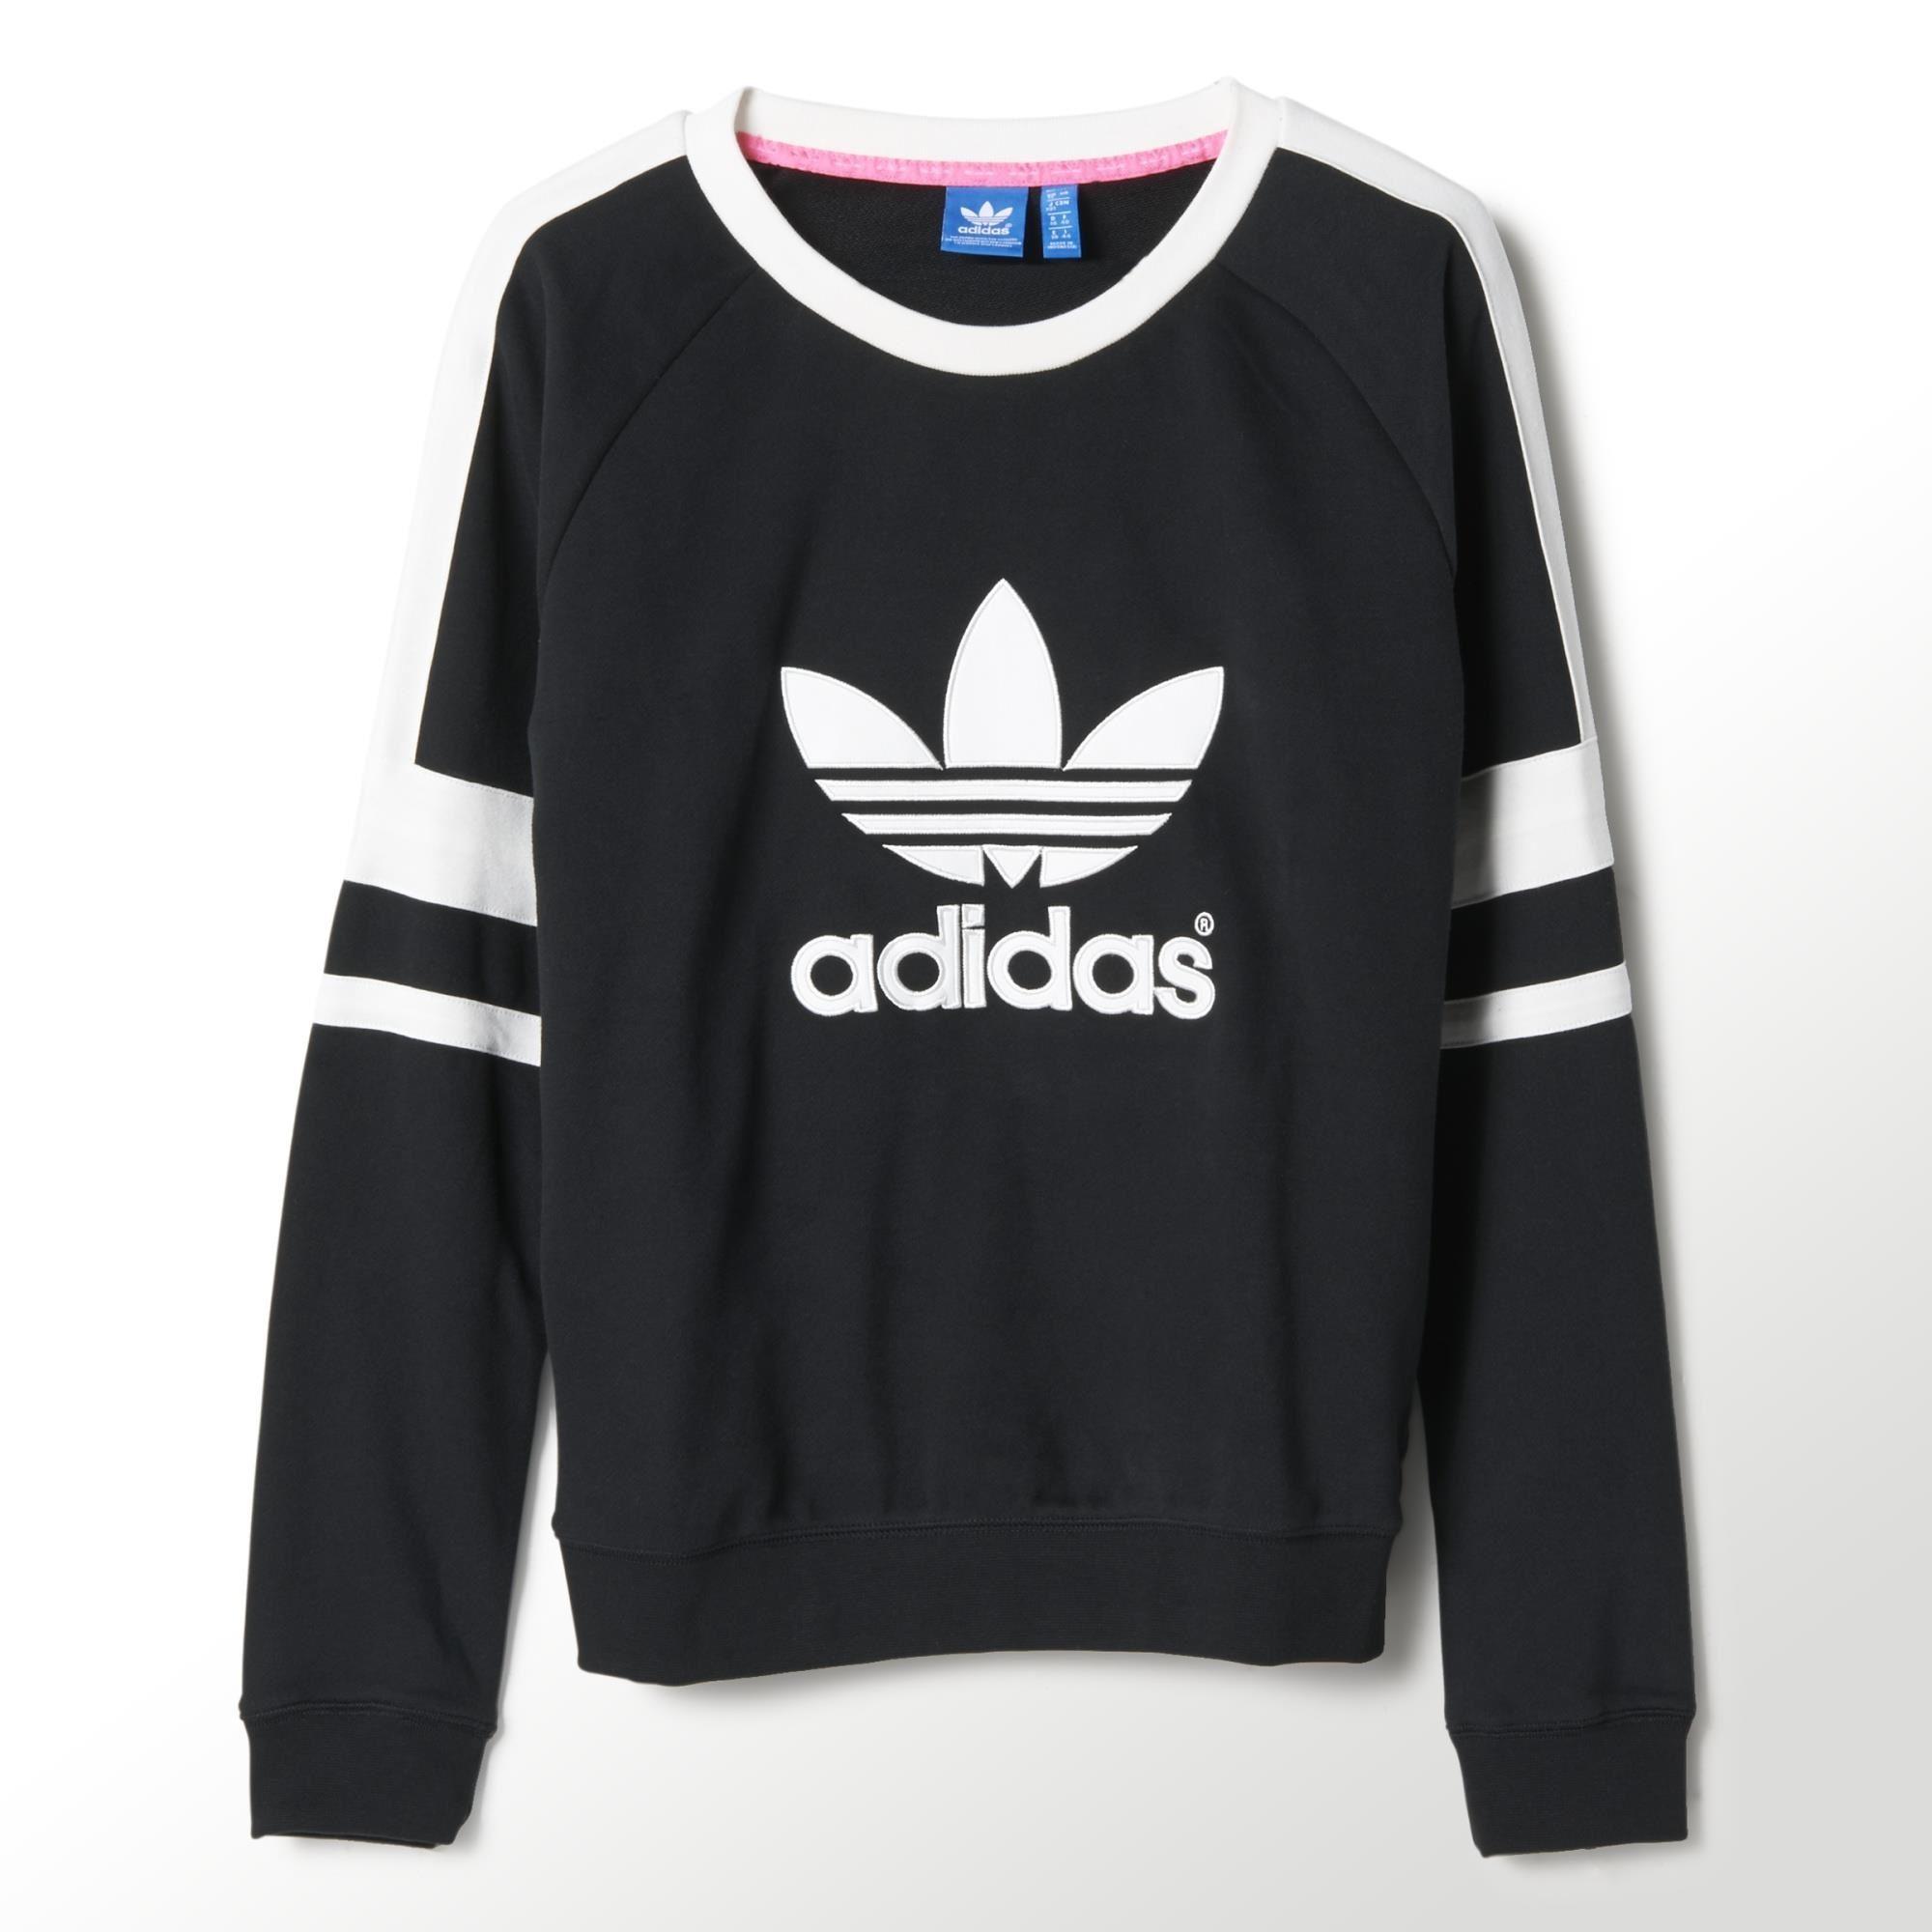 Adidas Logo Crew Sweatshirt Adidas Us Adidas Women Adidas Outfit Hoodies Womens [ 2000 x 2000 Pixel ]